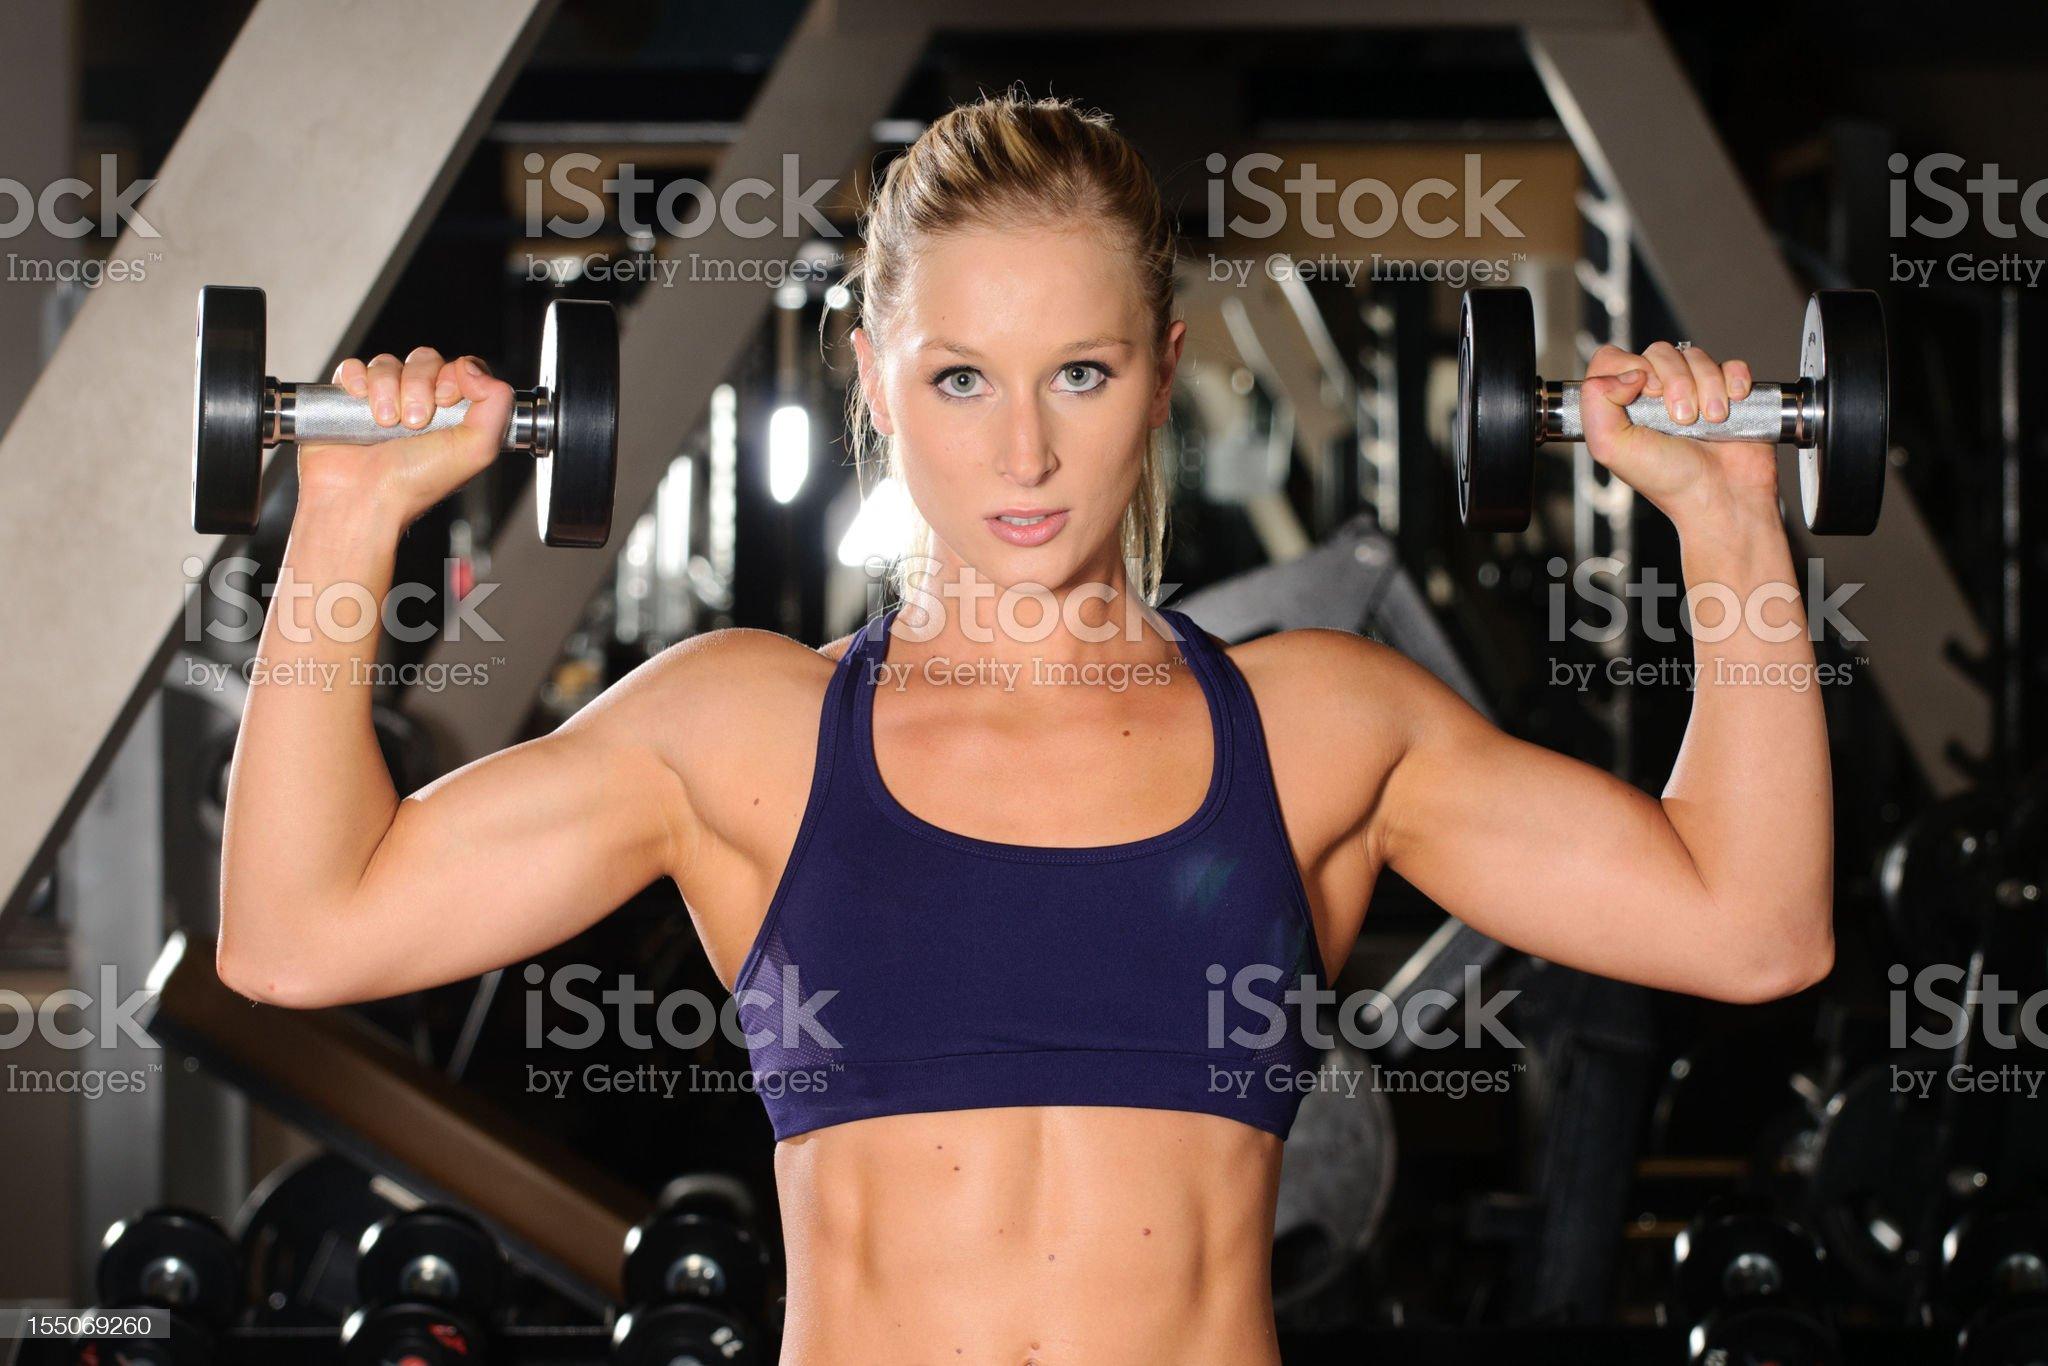 Dumbbell Shoulder Press royalty-free stock photo